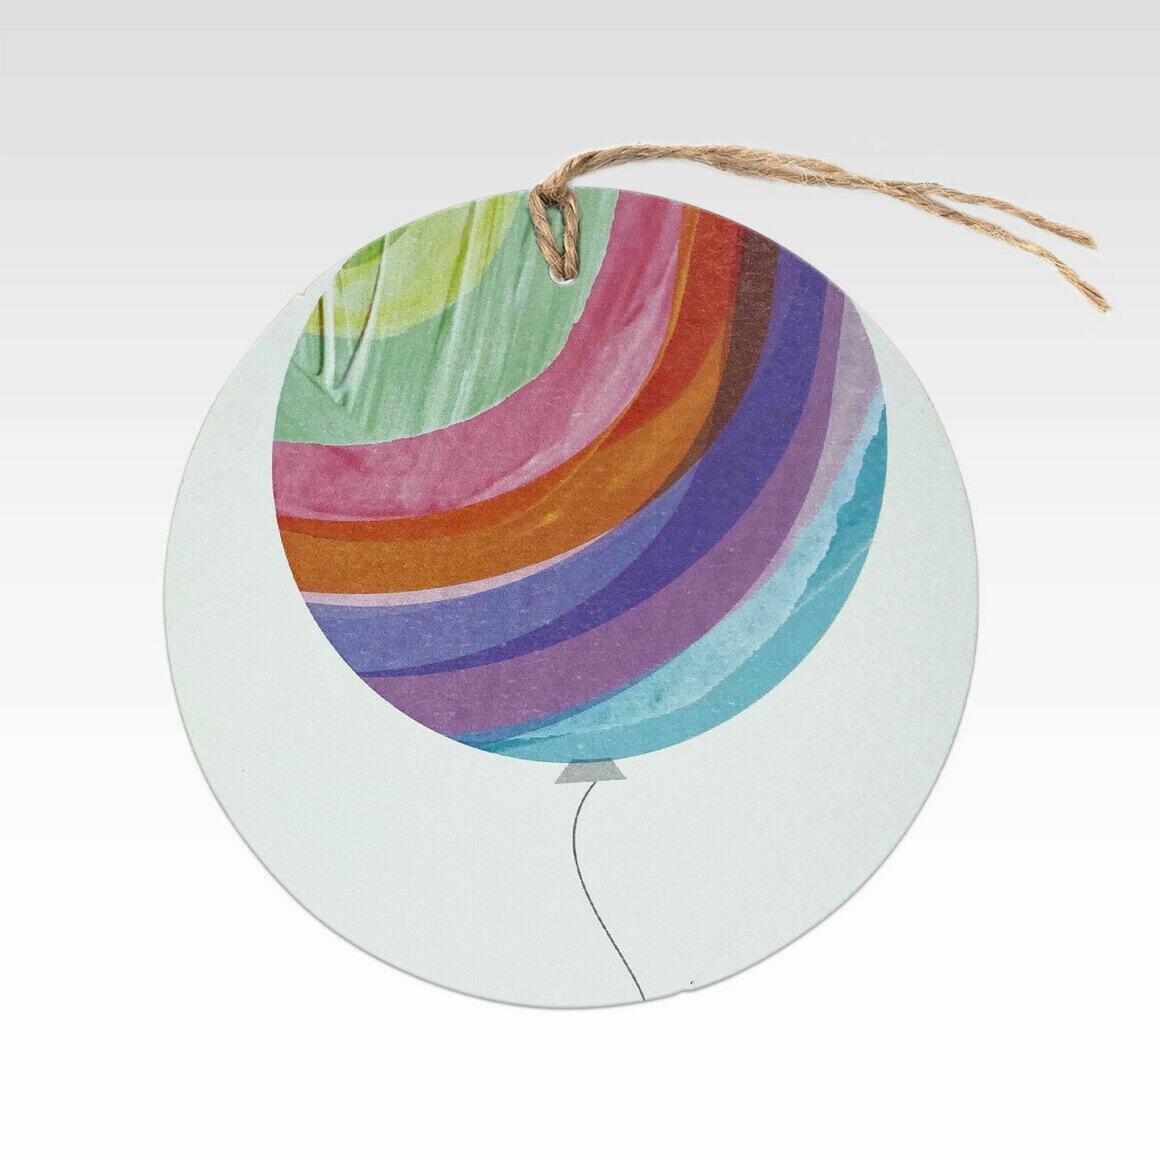 TAG078 – Rainbow Balloon   Trada Marketplace